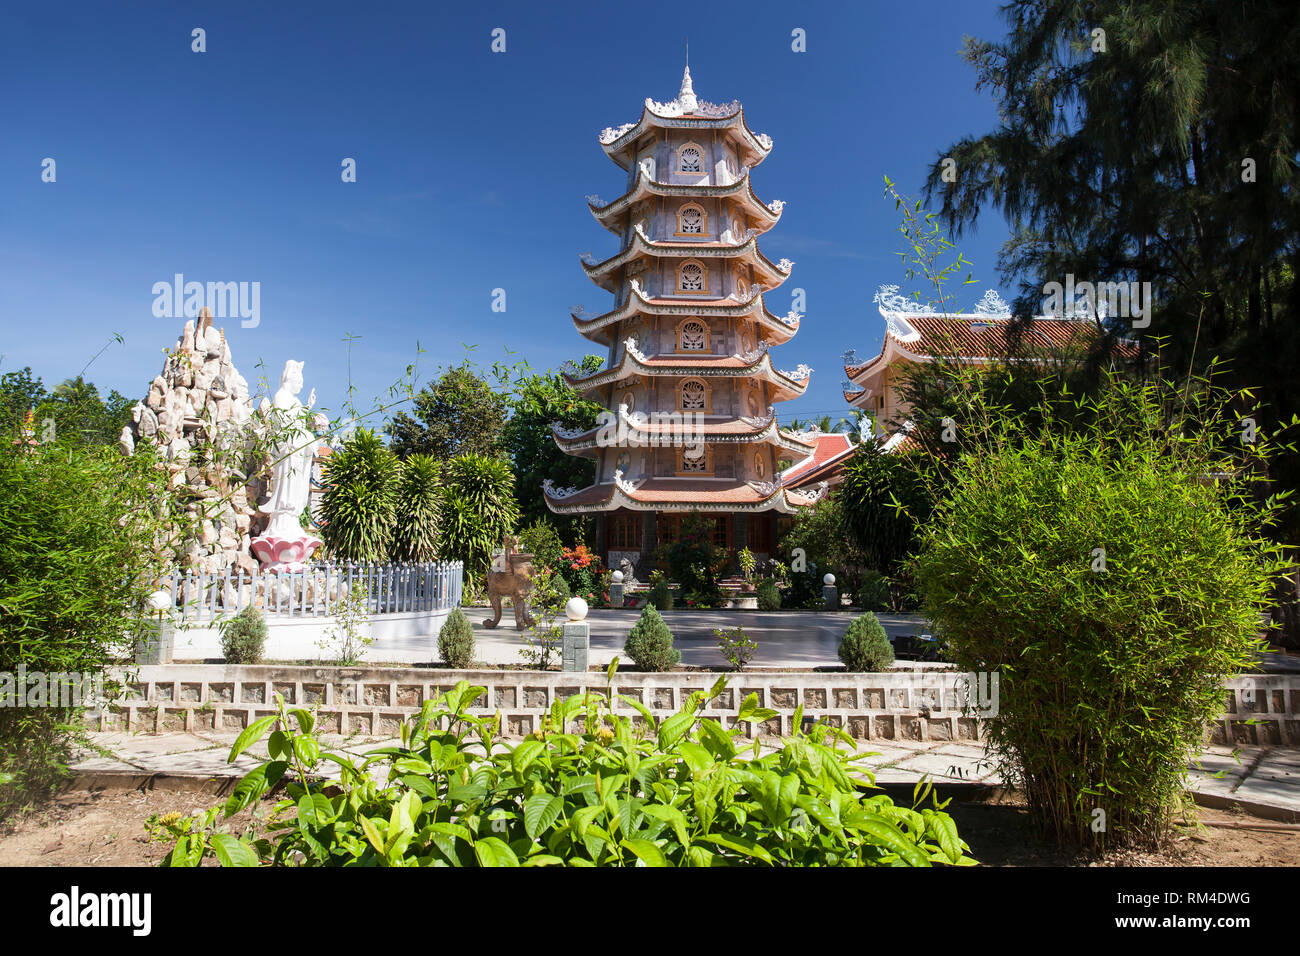 Dieu An Pagoda,temple, in Thap Cham, Phan Rang,, Ninh Thuan, Vietnam Stock Photo